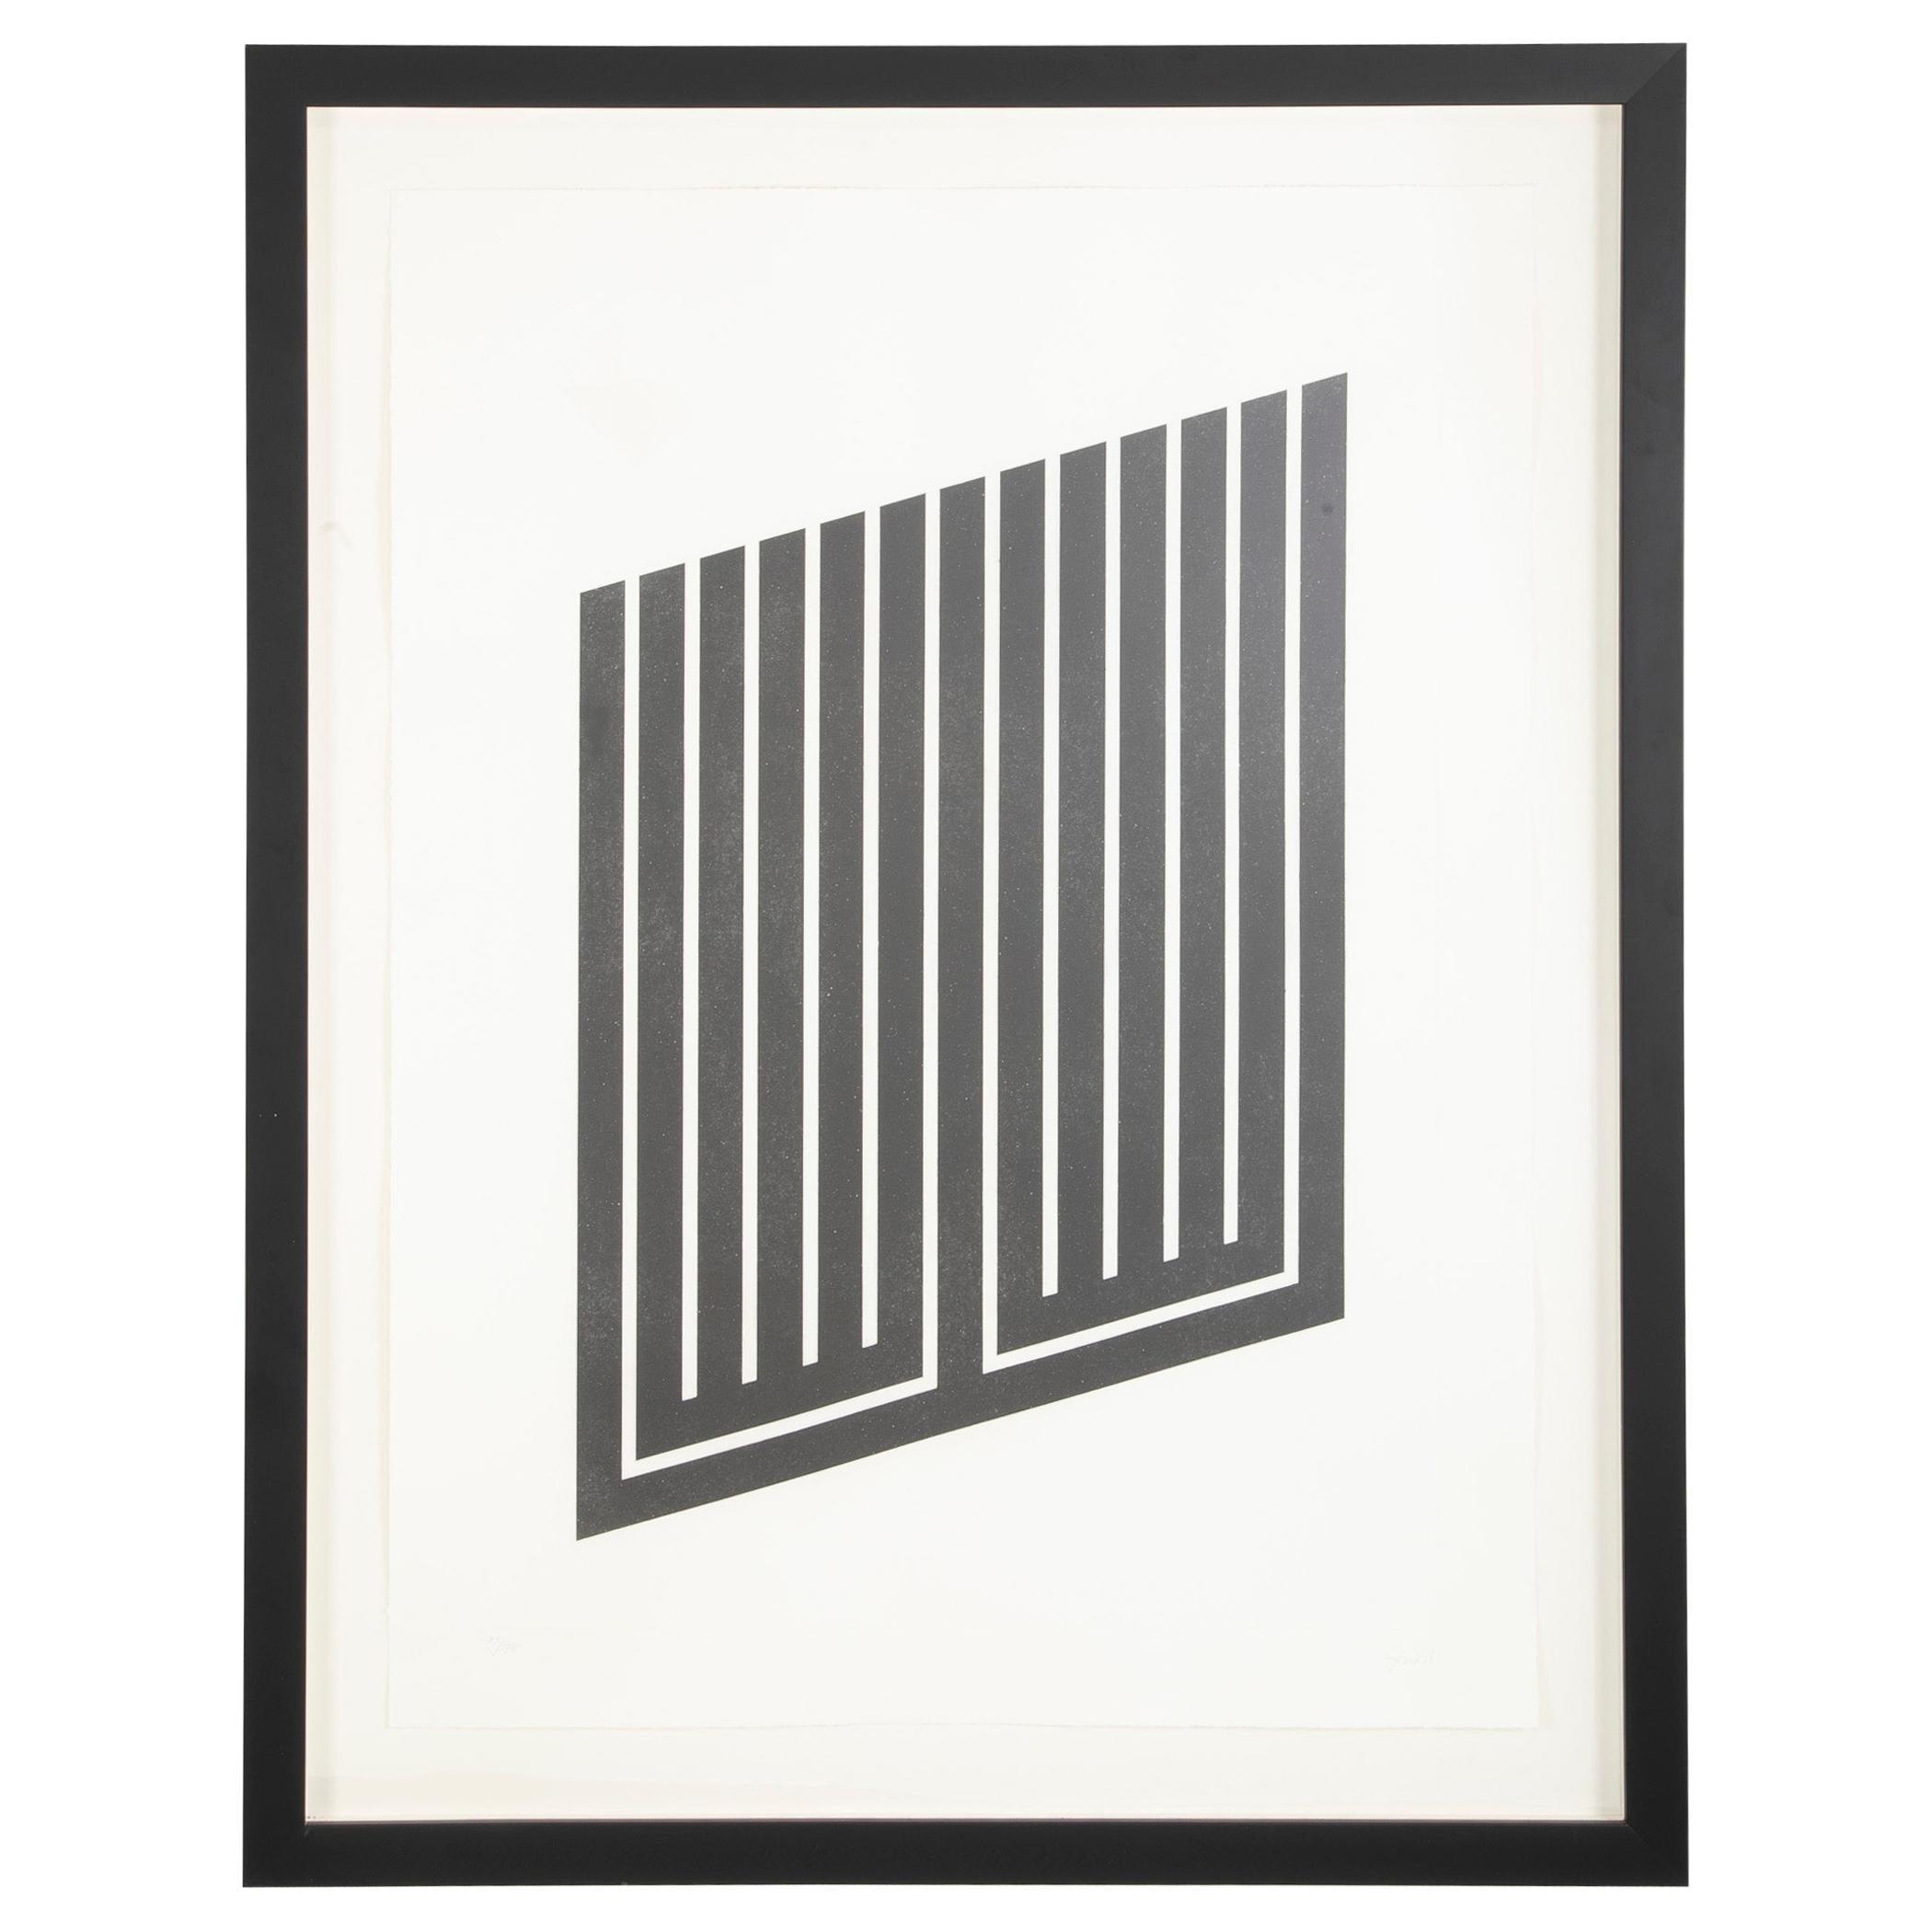 Donald Judd, Untitled, 1978-1979